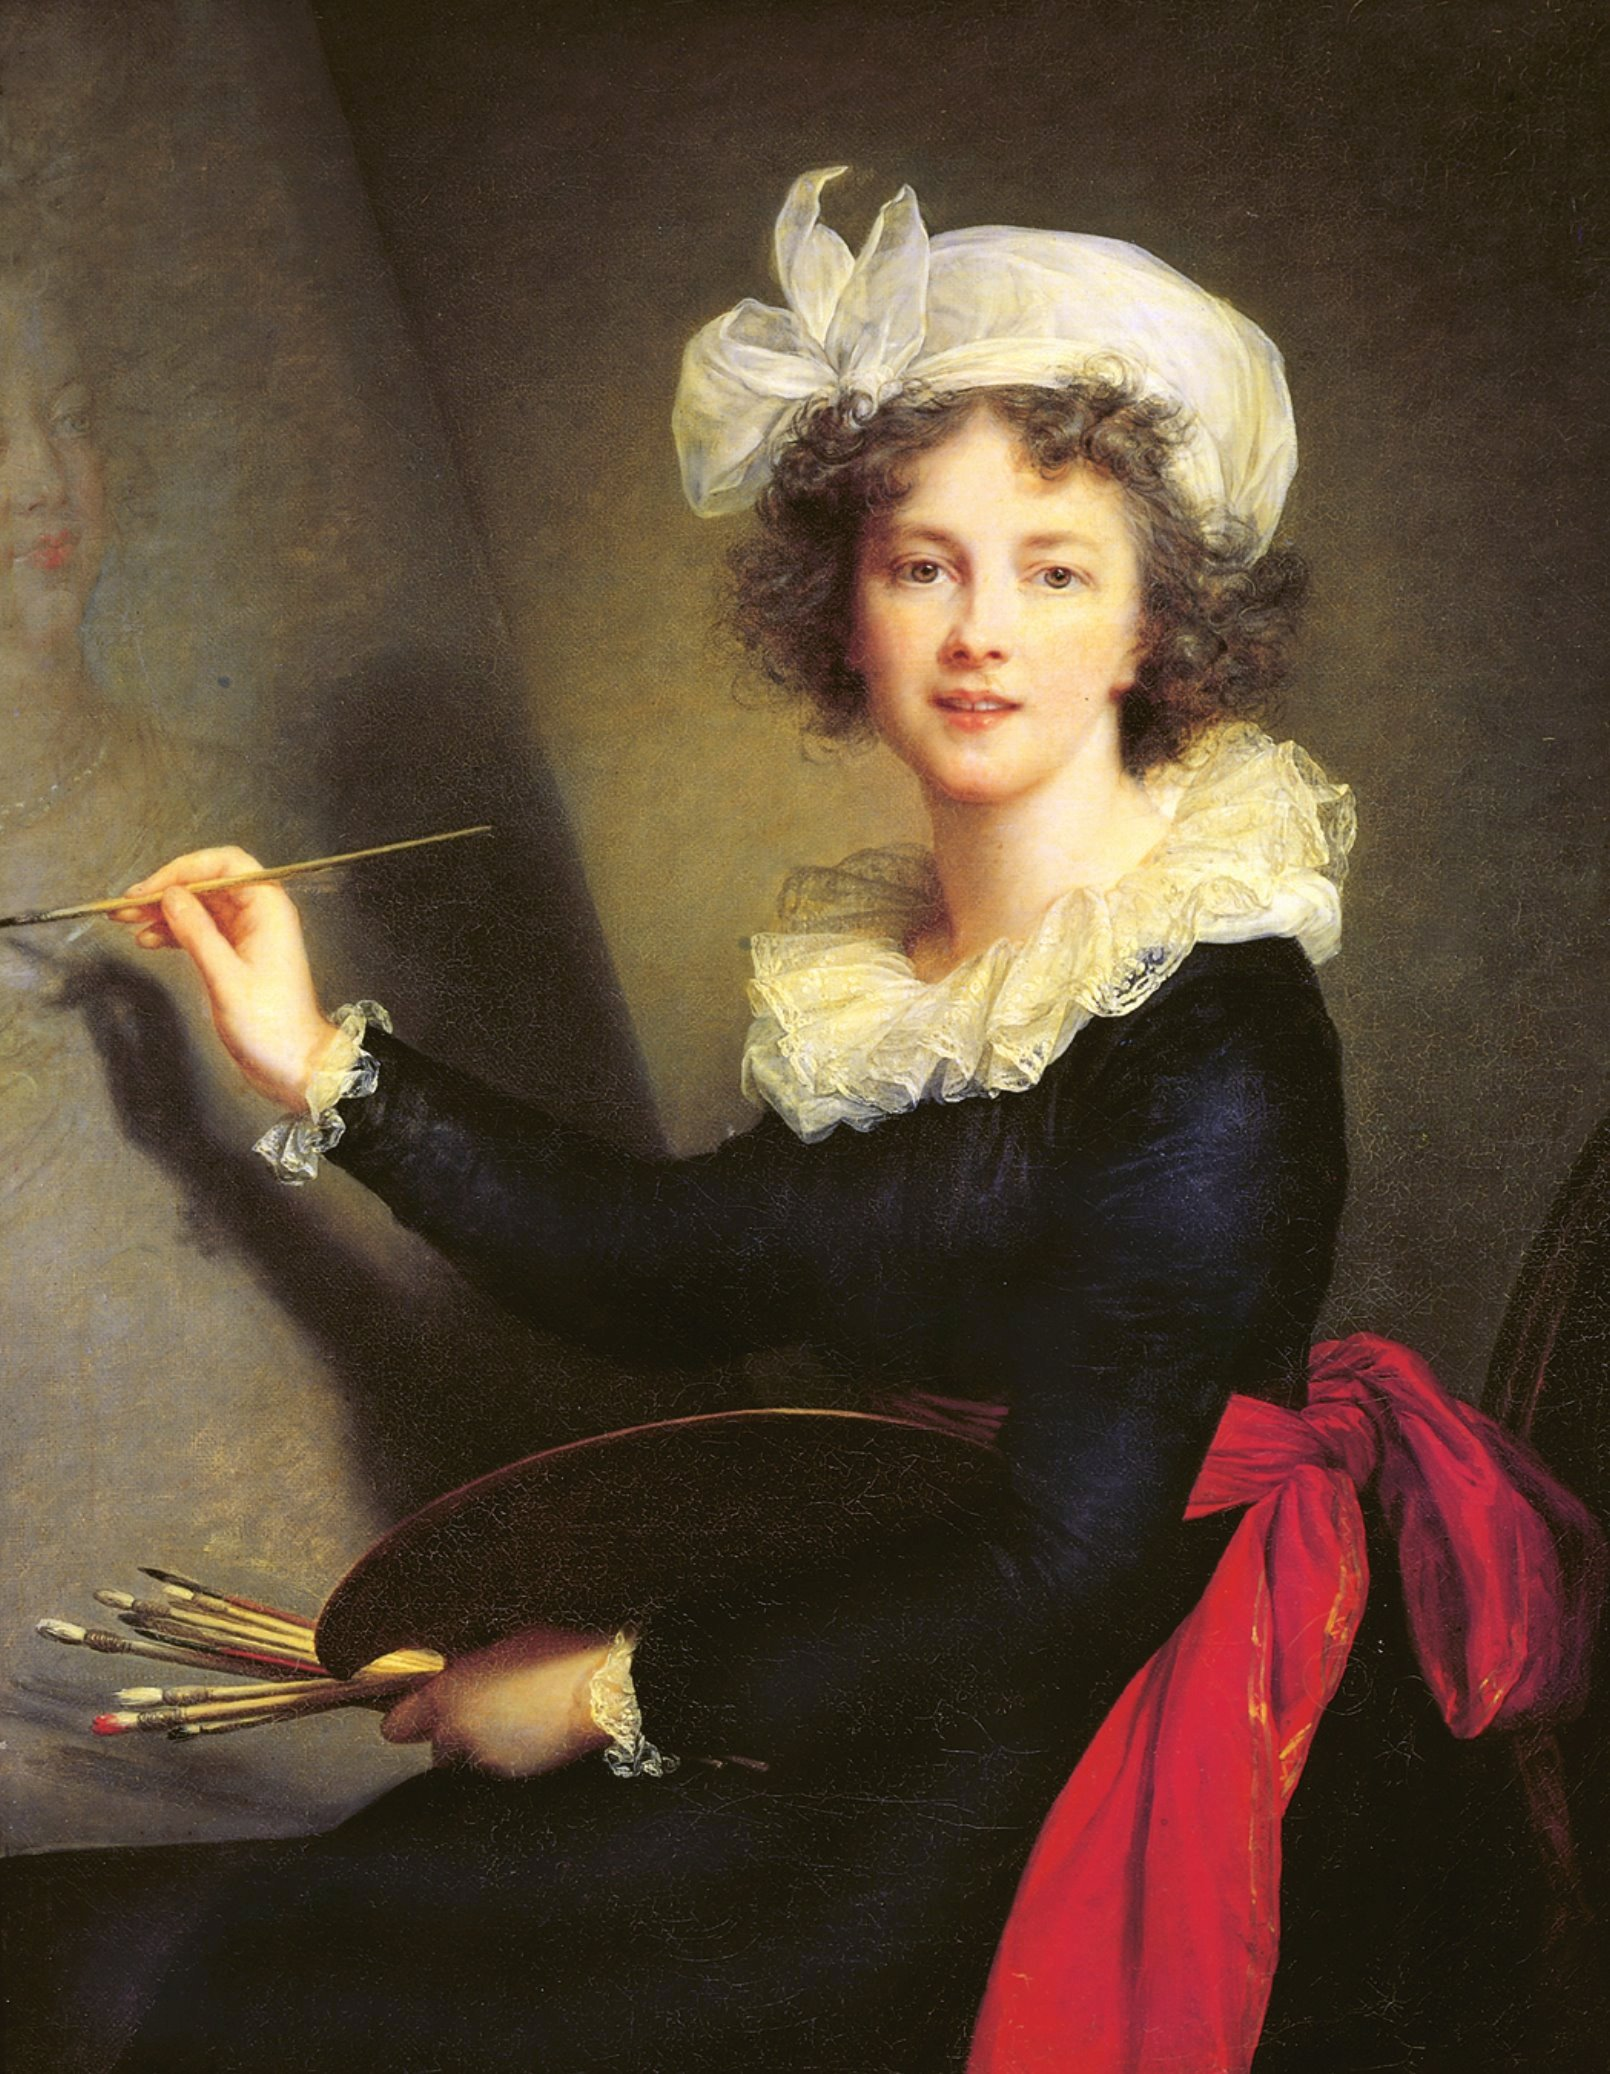 Elisabeth Louise Vigée Le Brun,Self-portrait, 1790. Galleria degli Uffizi, Corridoio Vasariano, Florence.